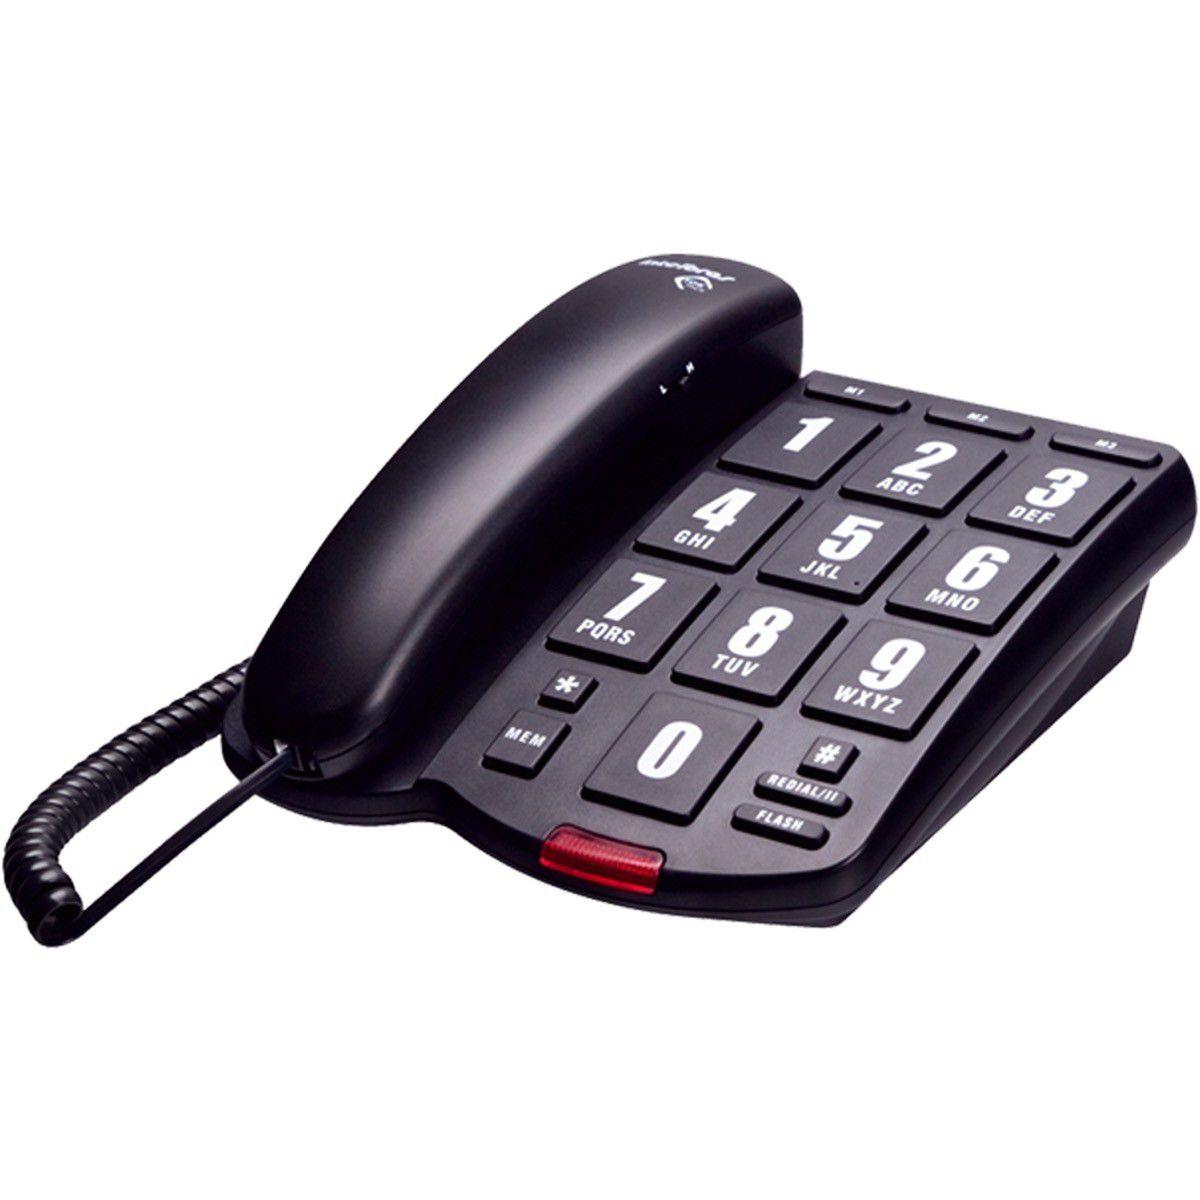 Telefone C/Fio Tok Facil Intelbras